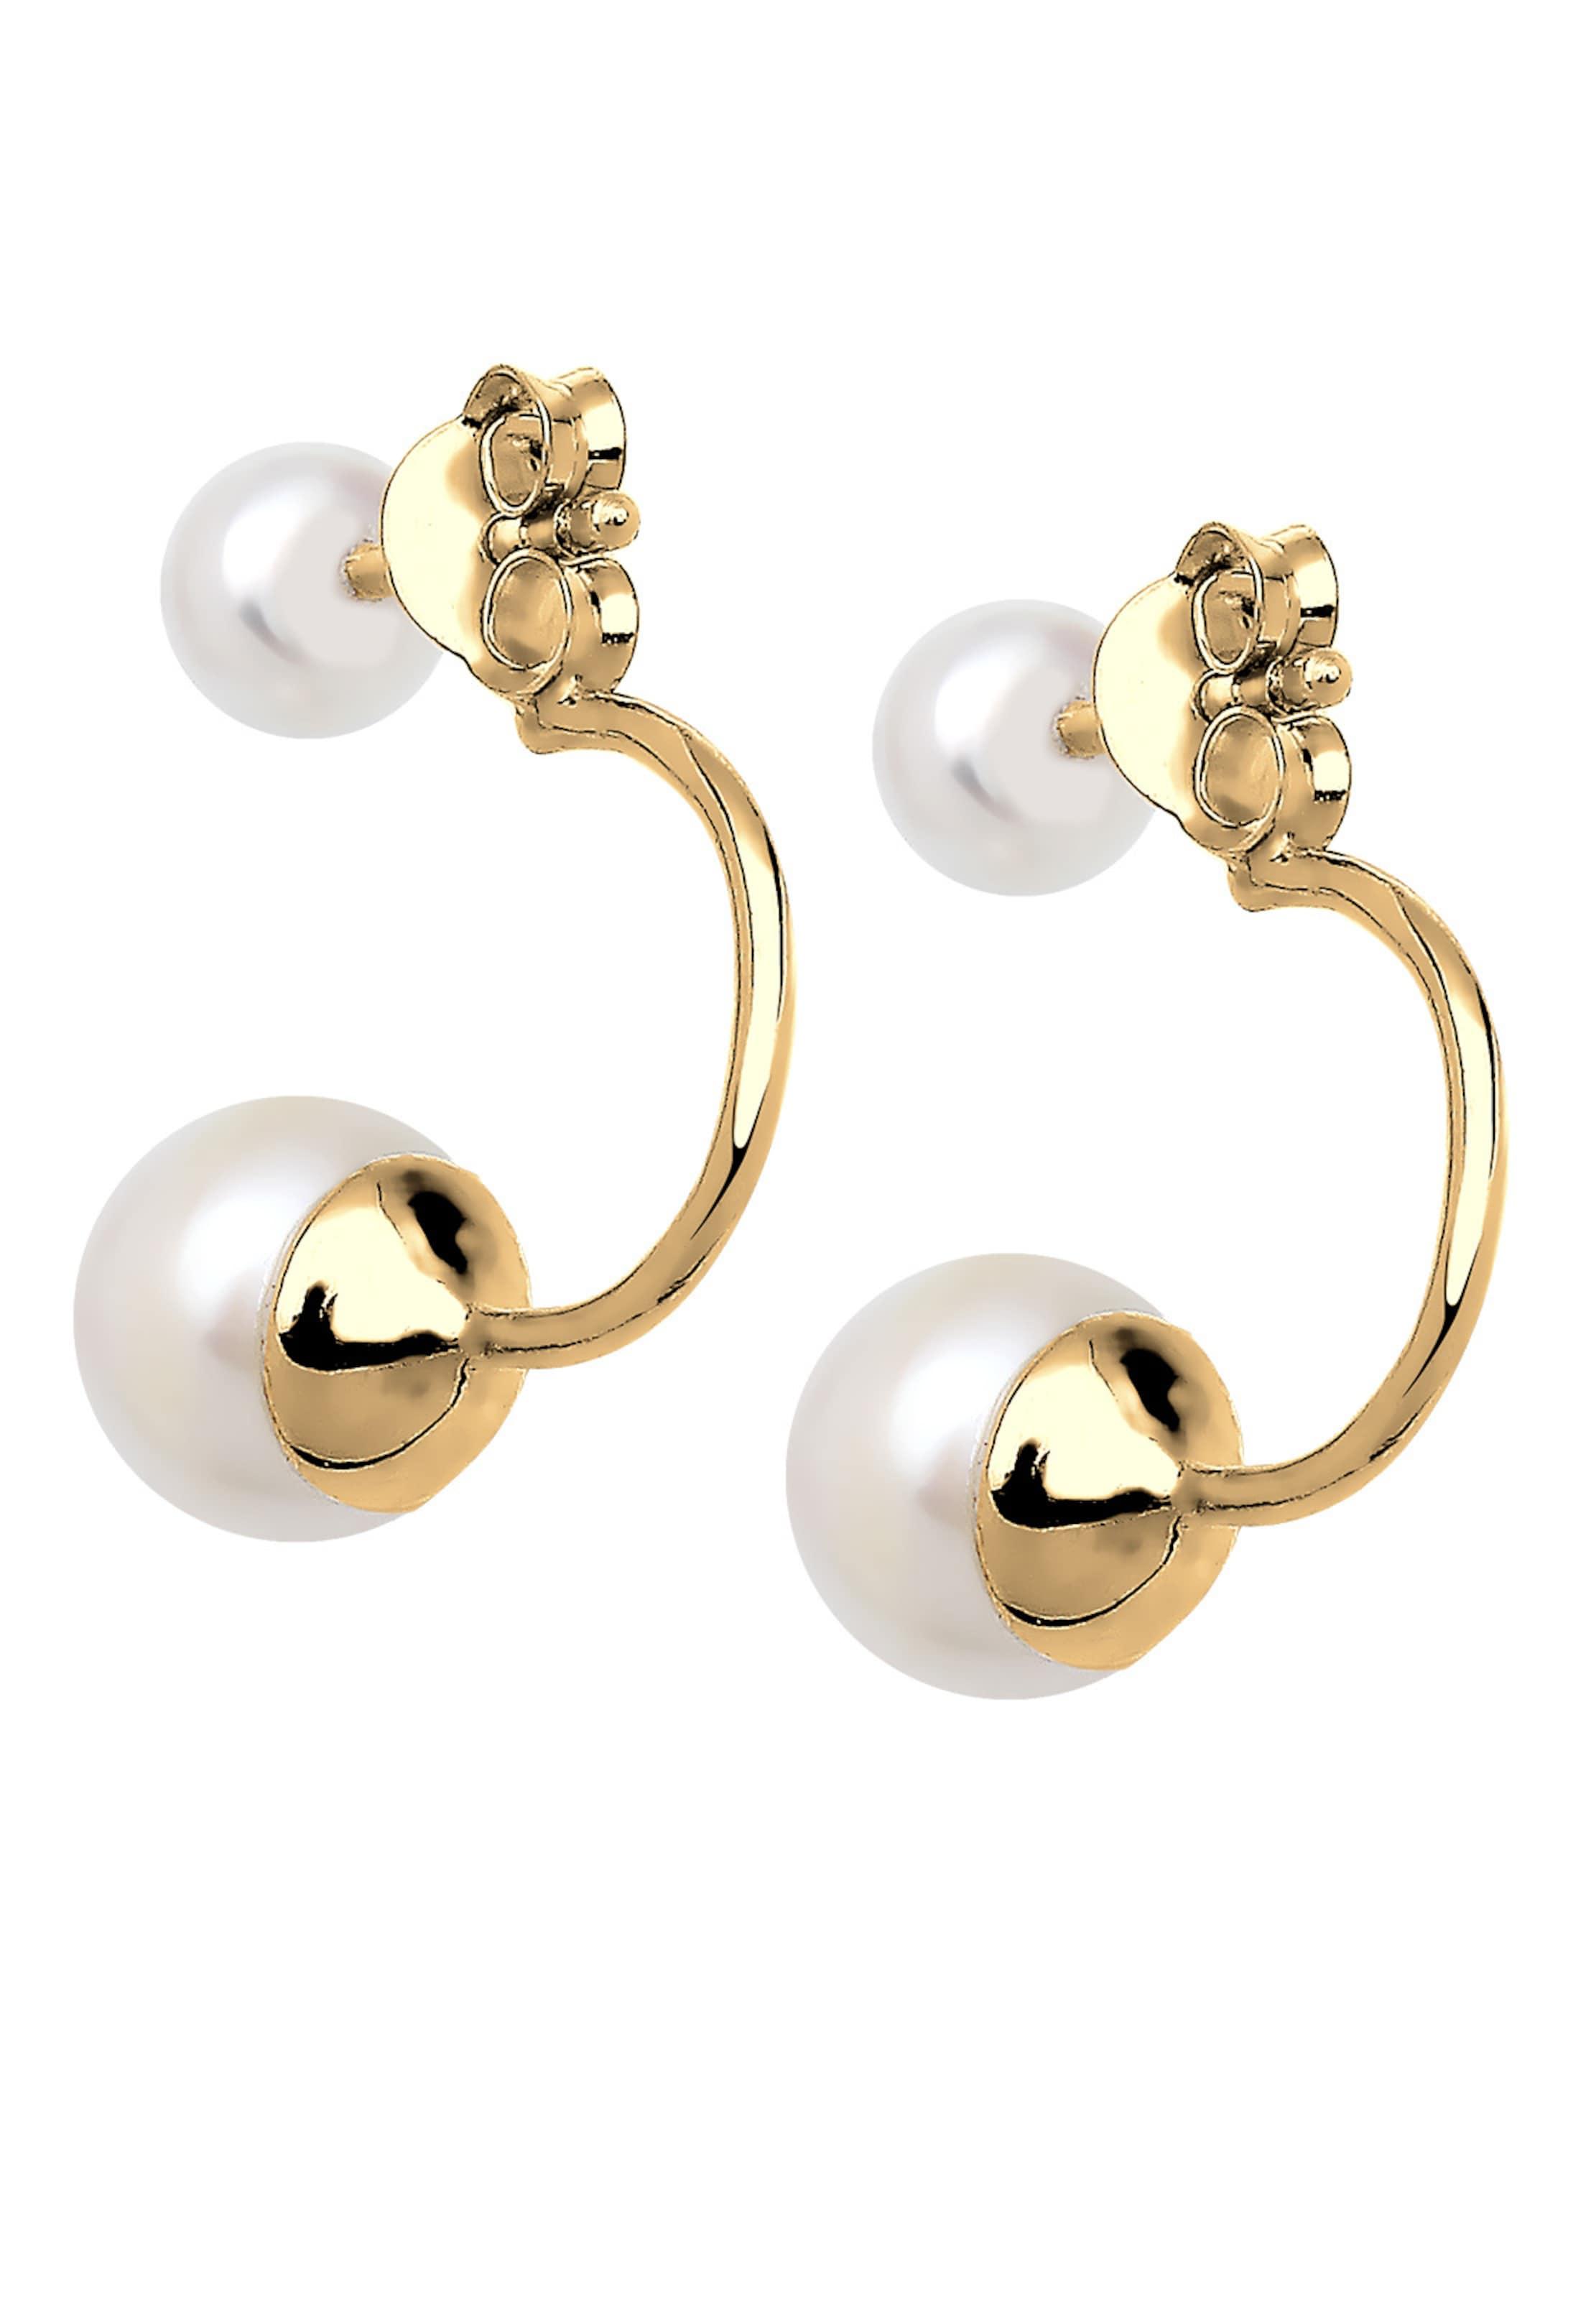 Ohrringe In Elli GoldWeiß Elli In Elli Ohrringe GoldWeiß 4AjL35cqR